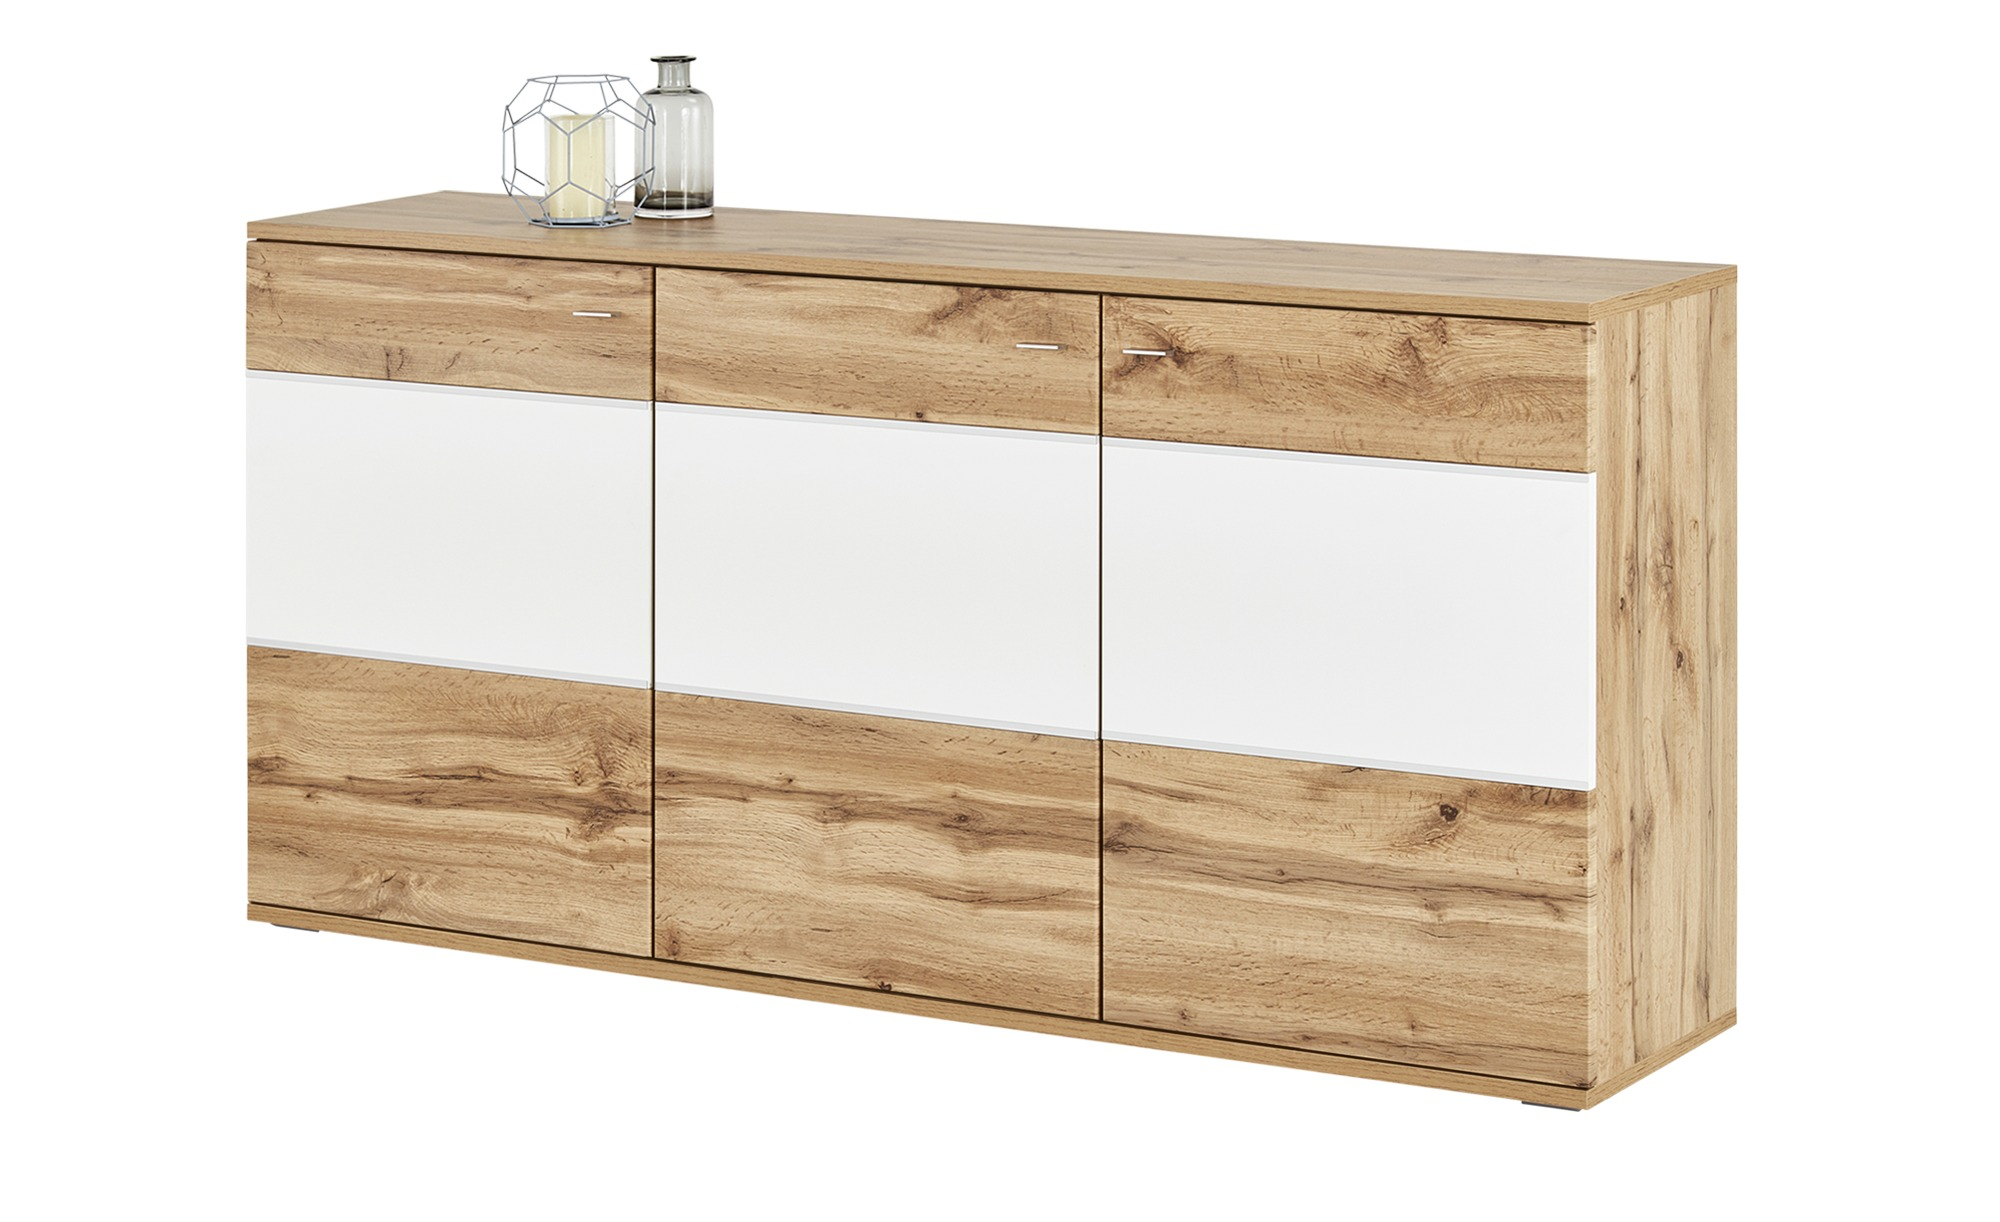 uno Sideboard  Alfonso ¦ Maße (cm): B: 181 H: 91 T: 44 Kommoden & Sideboards > Sideboards - Höffner